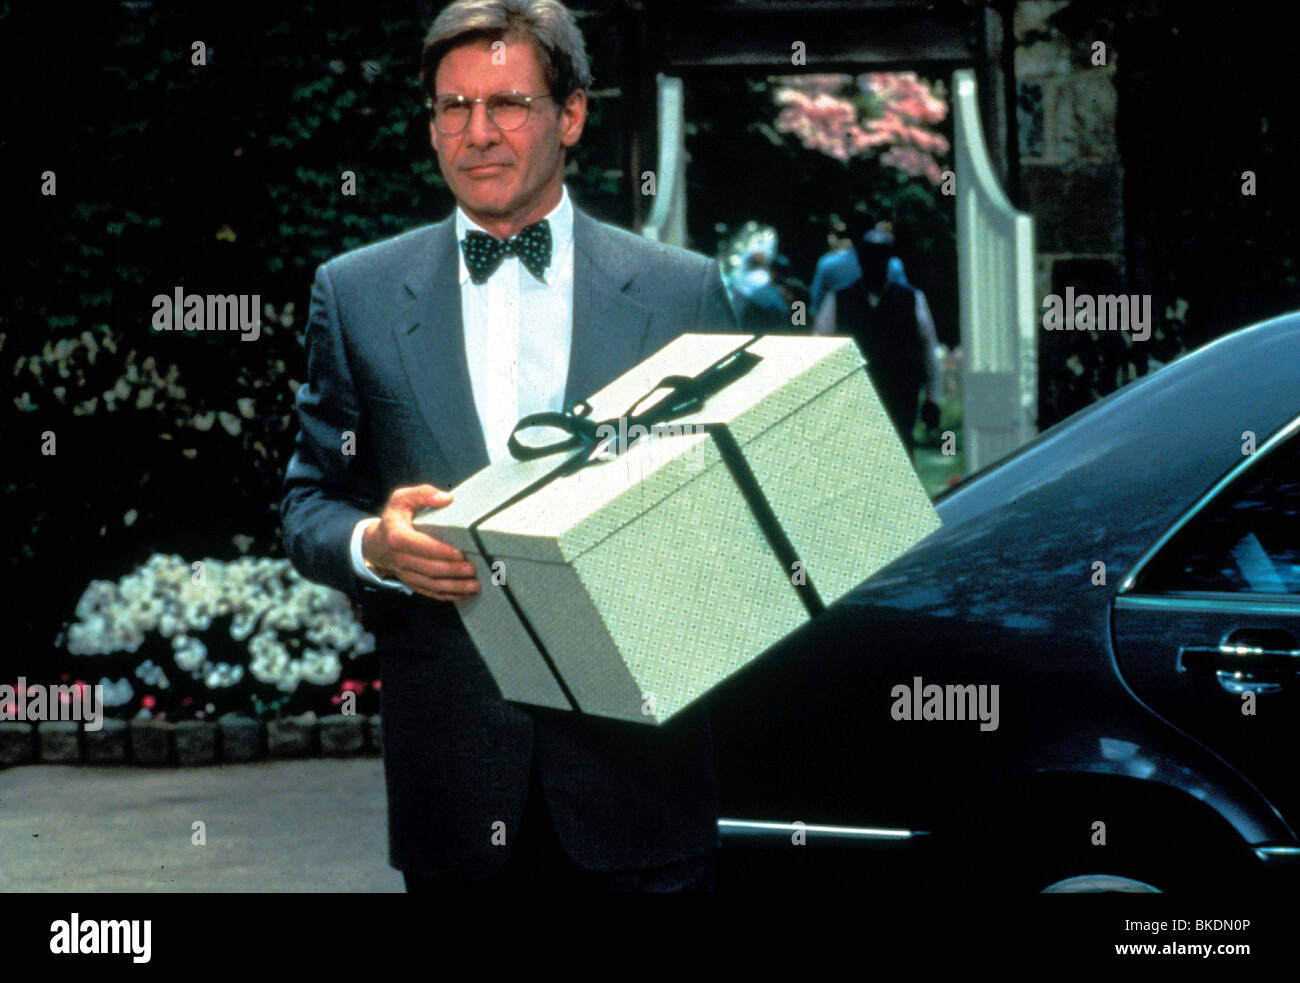 SABRINA -1995 HARRISON FORD - Stock Image